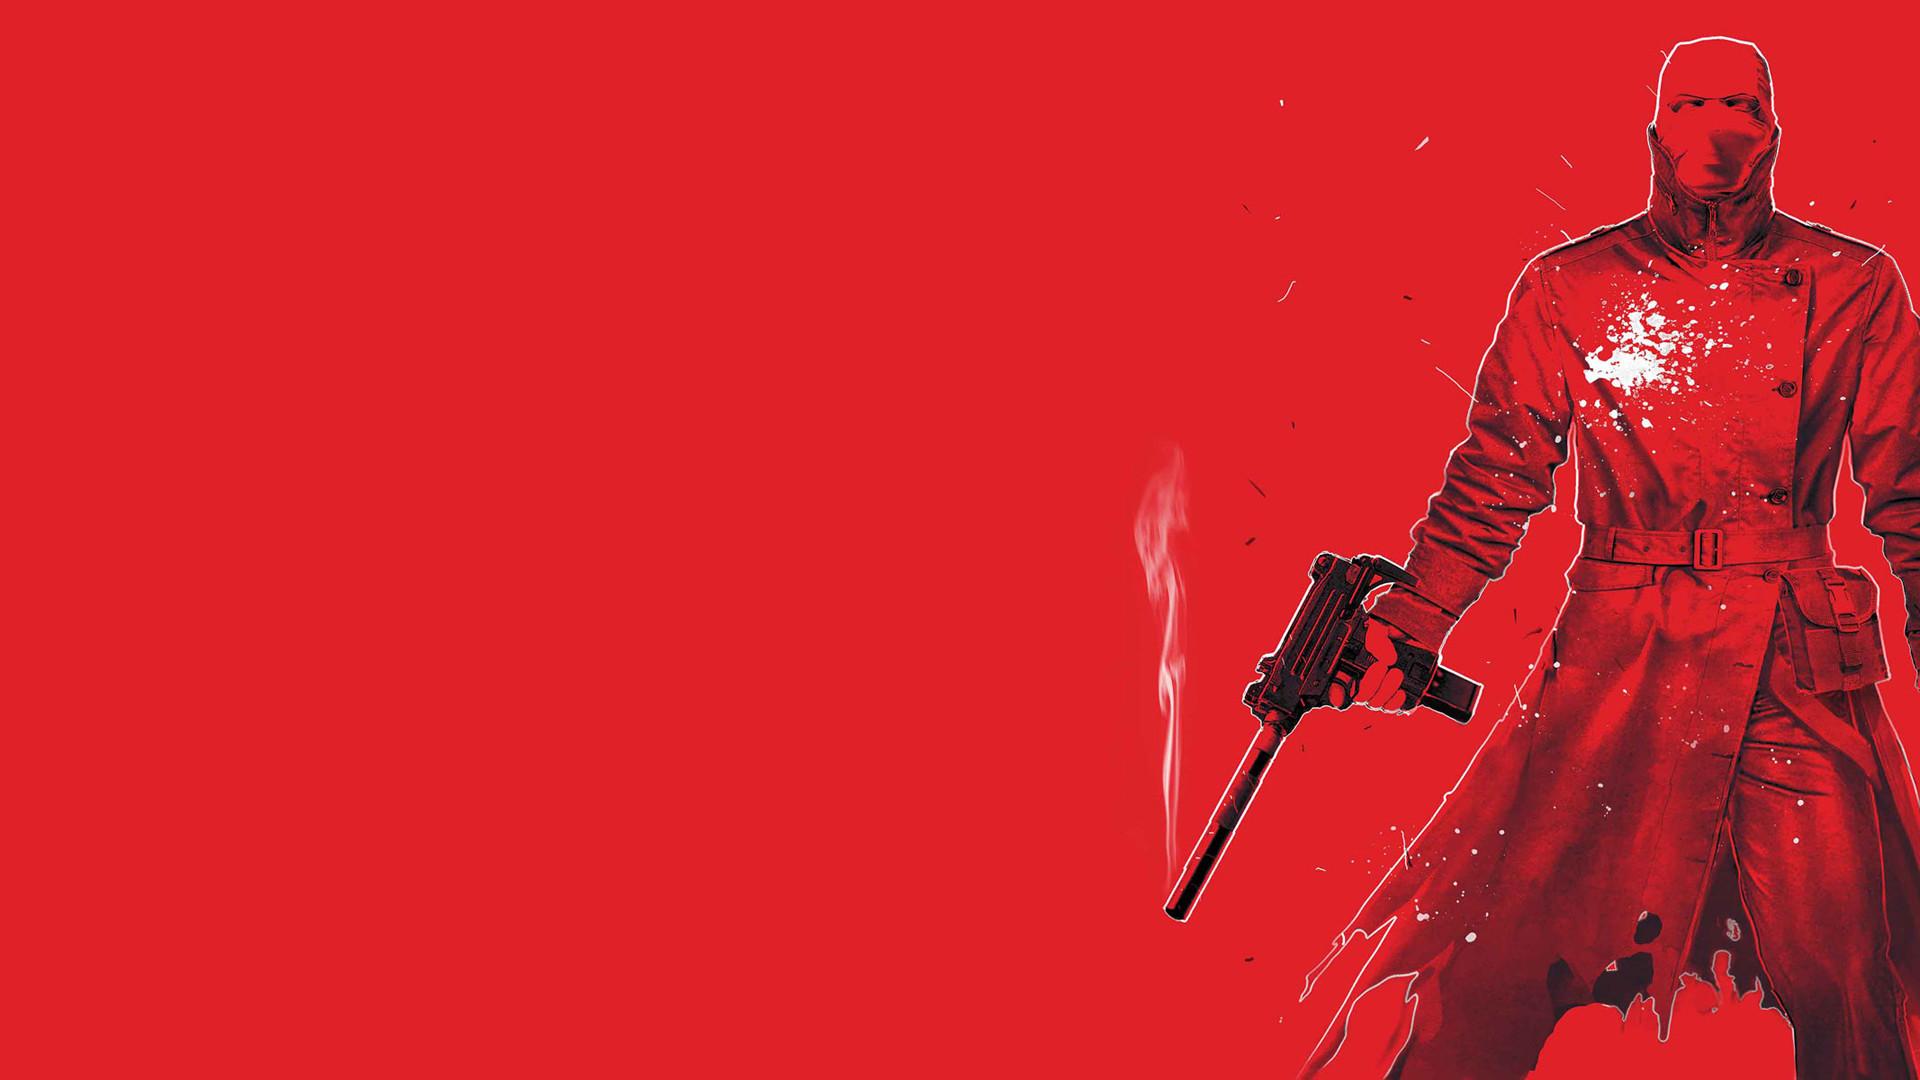 Serier – Red Hood Bakgrund